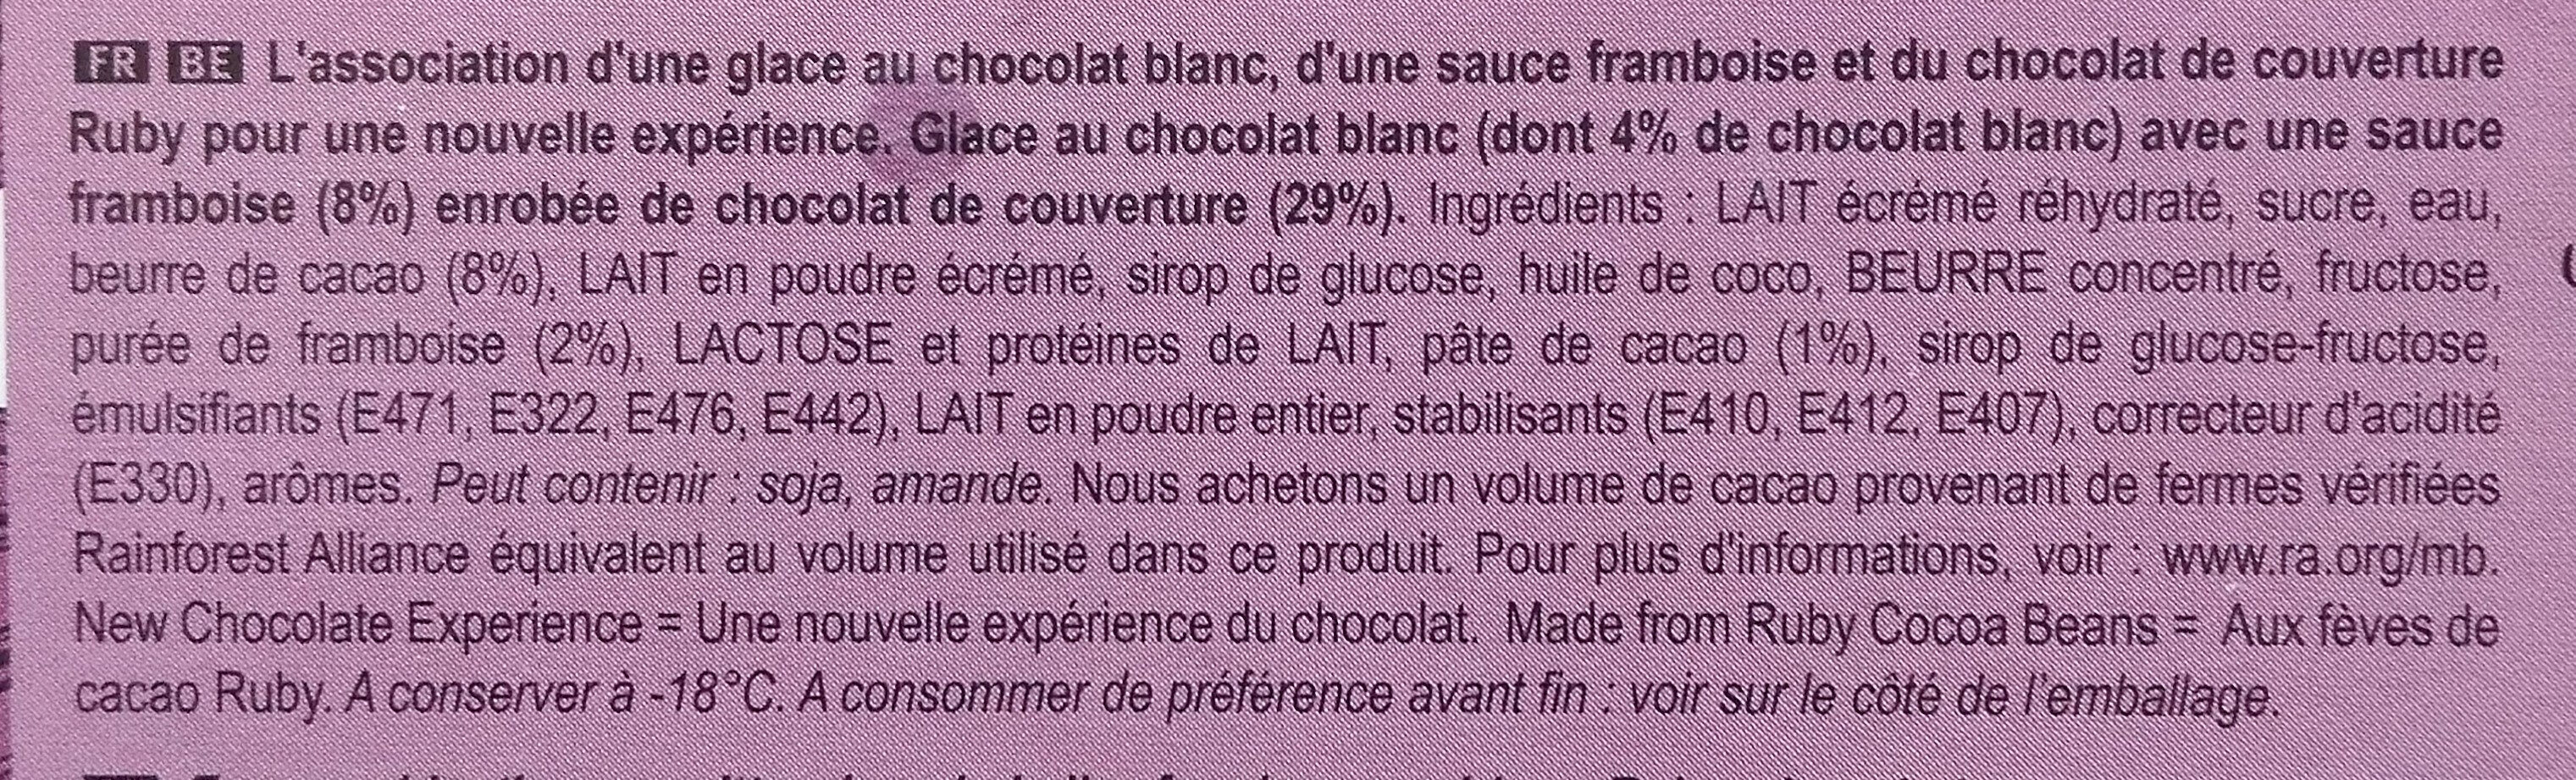 MAGNUM Glace Bâtonnet Ruby 4x90ml - Ingrédients - fr